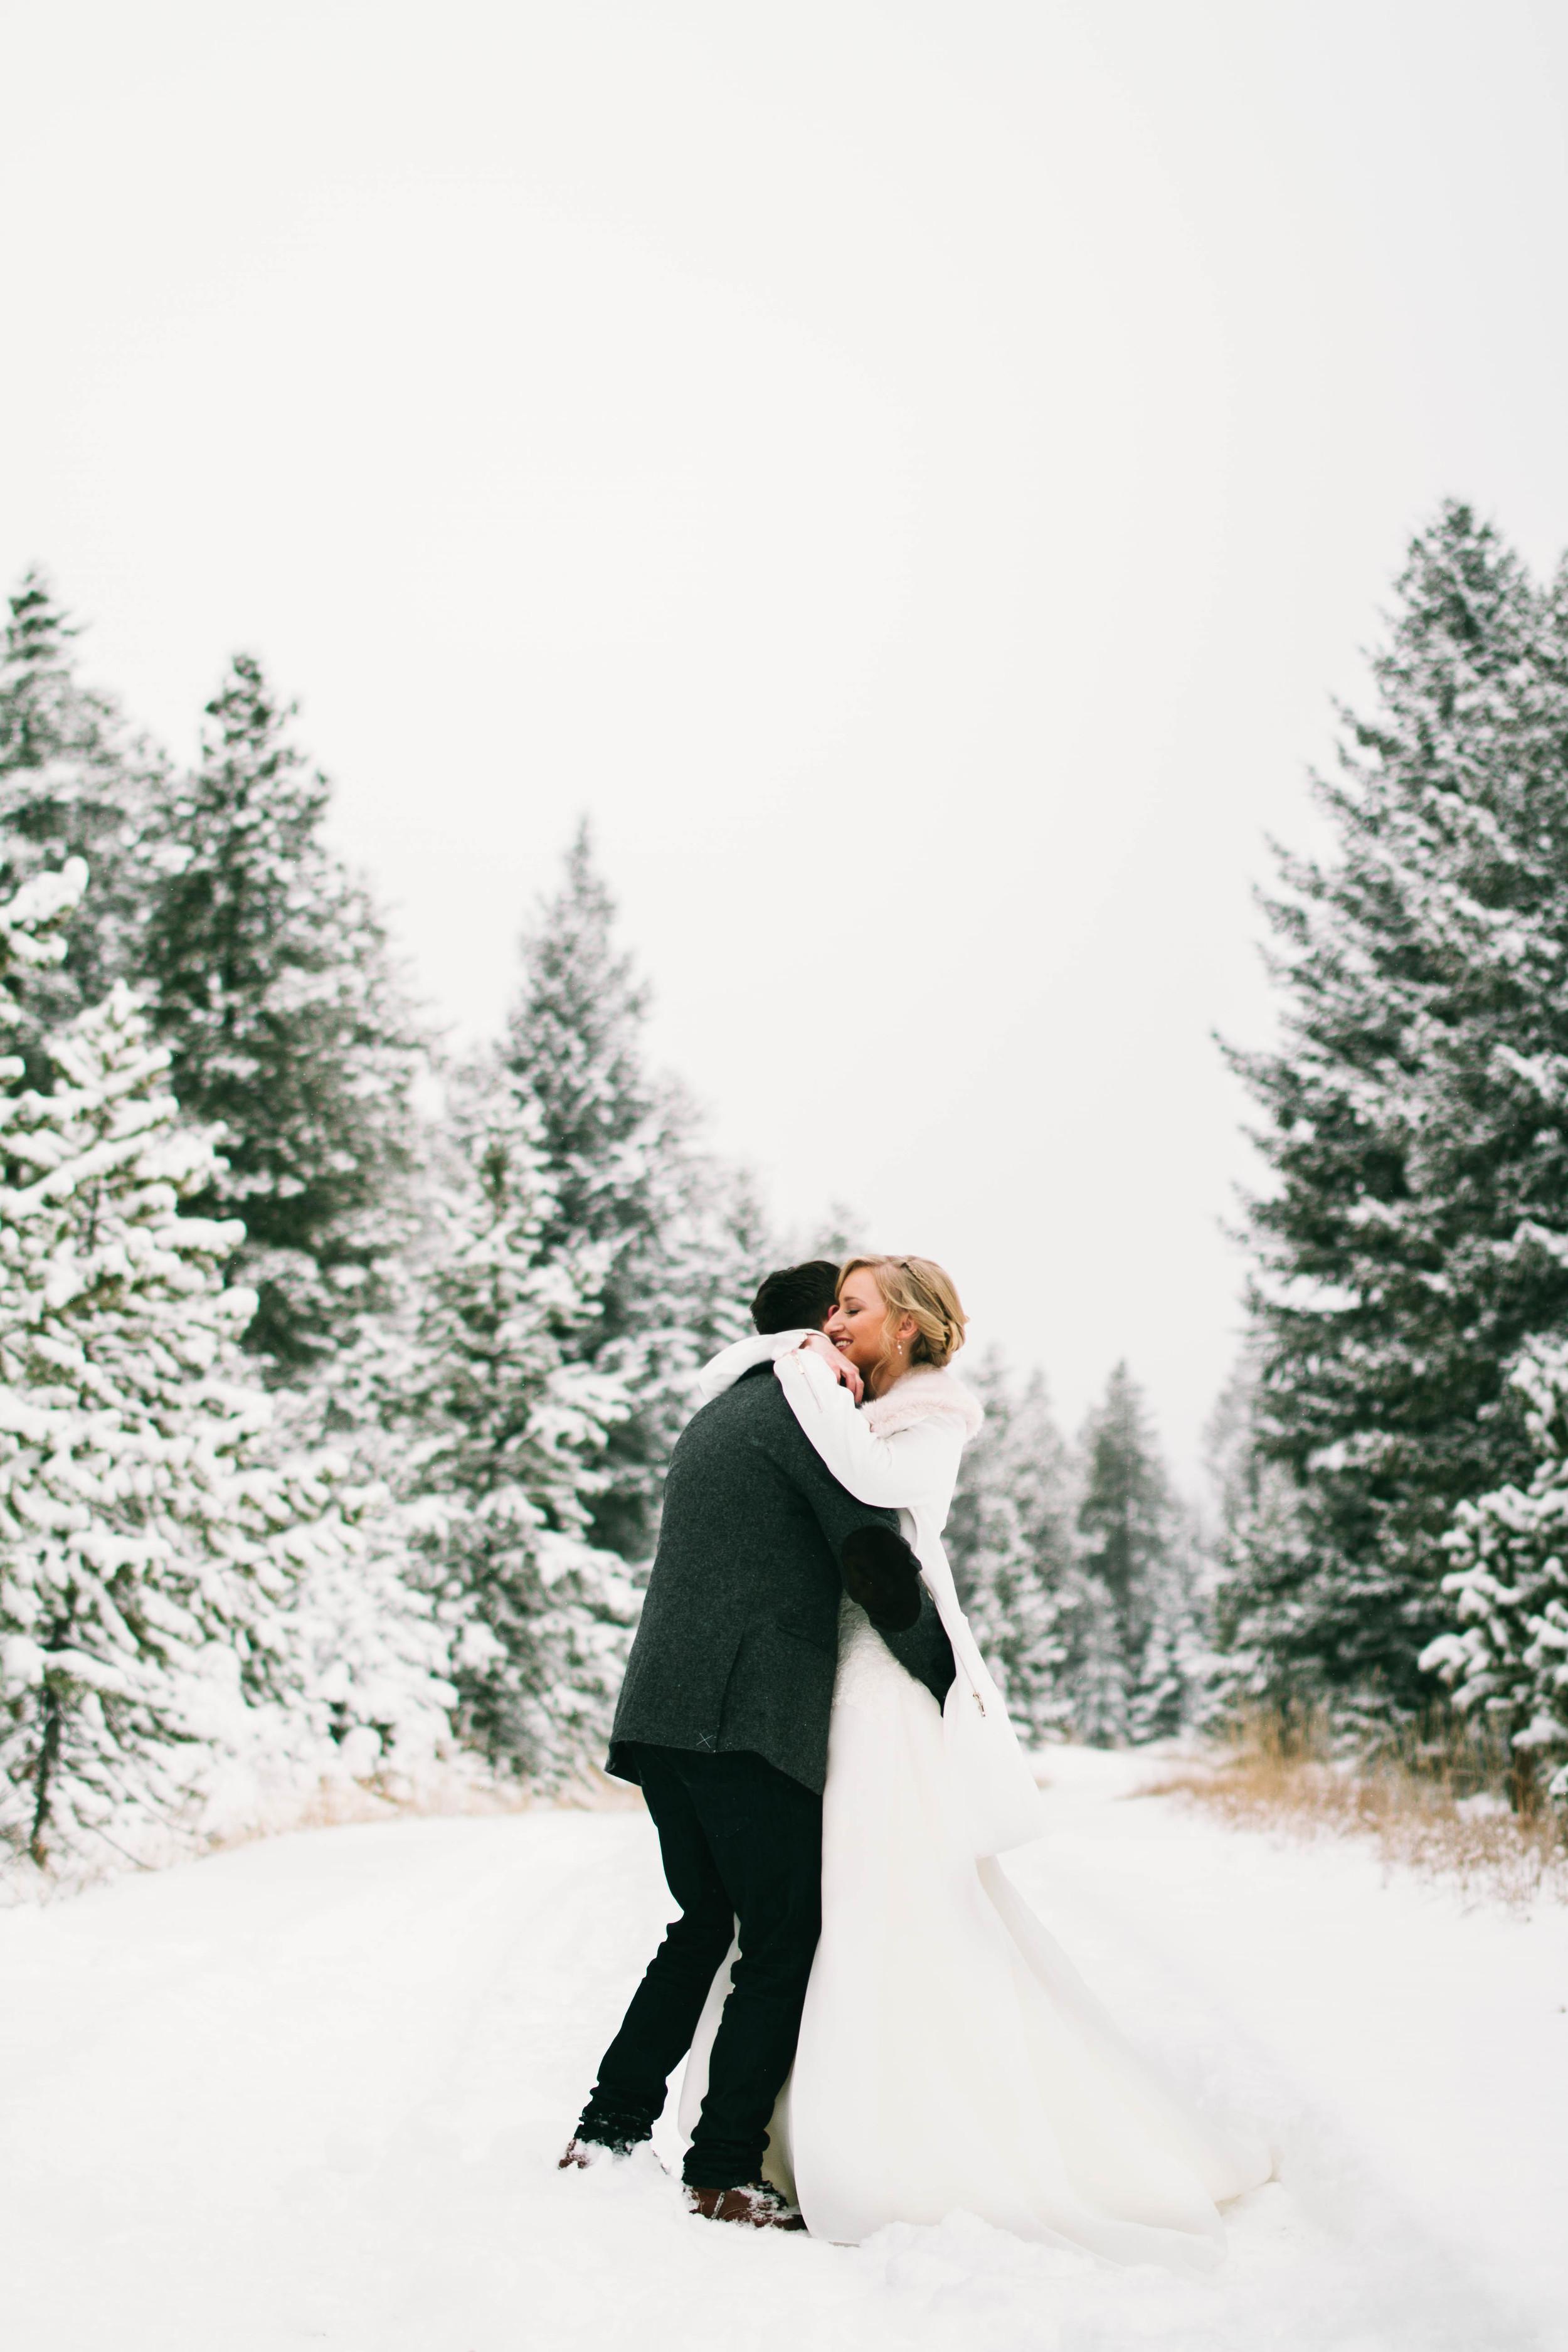 Bonin Wedding - Madeleine Bonin Photography-5781.jpg